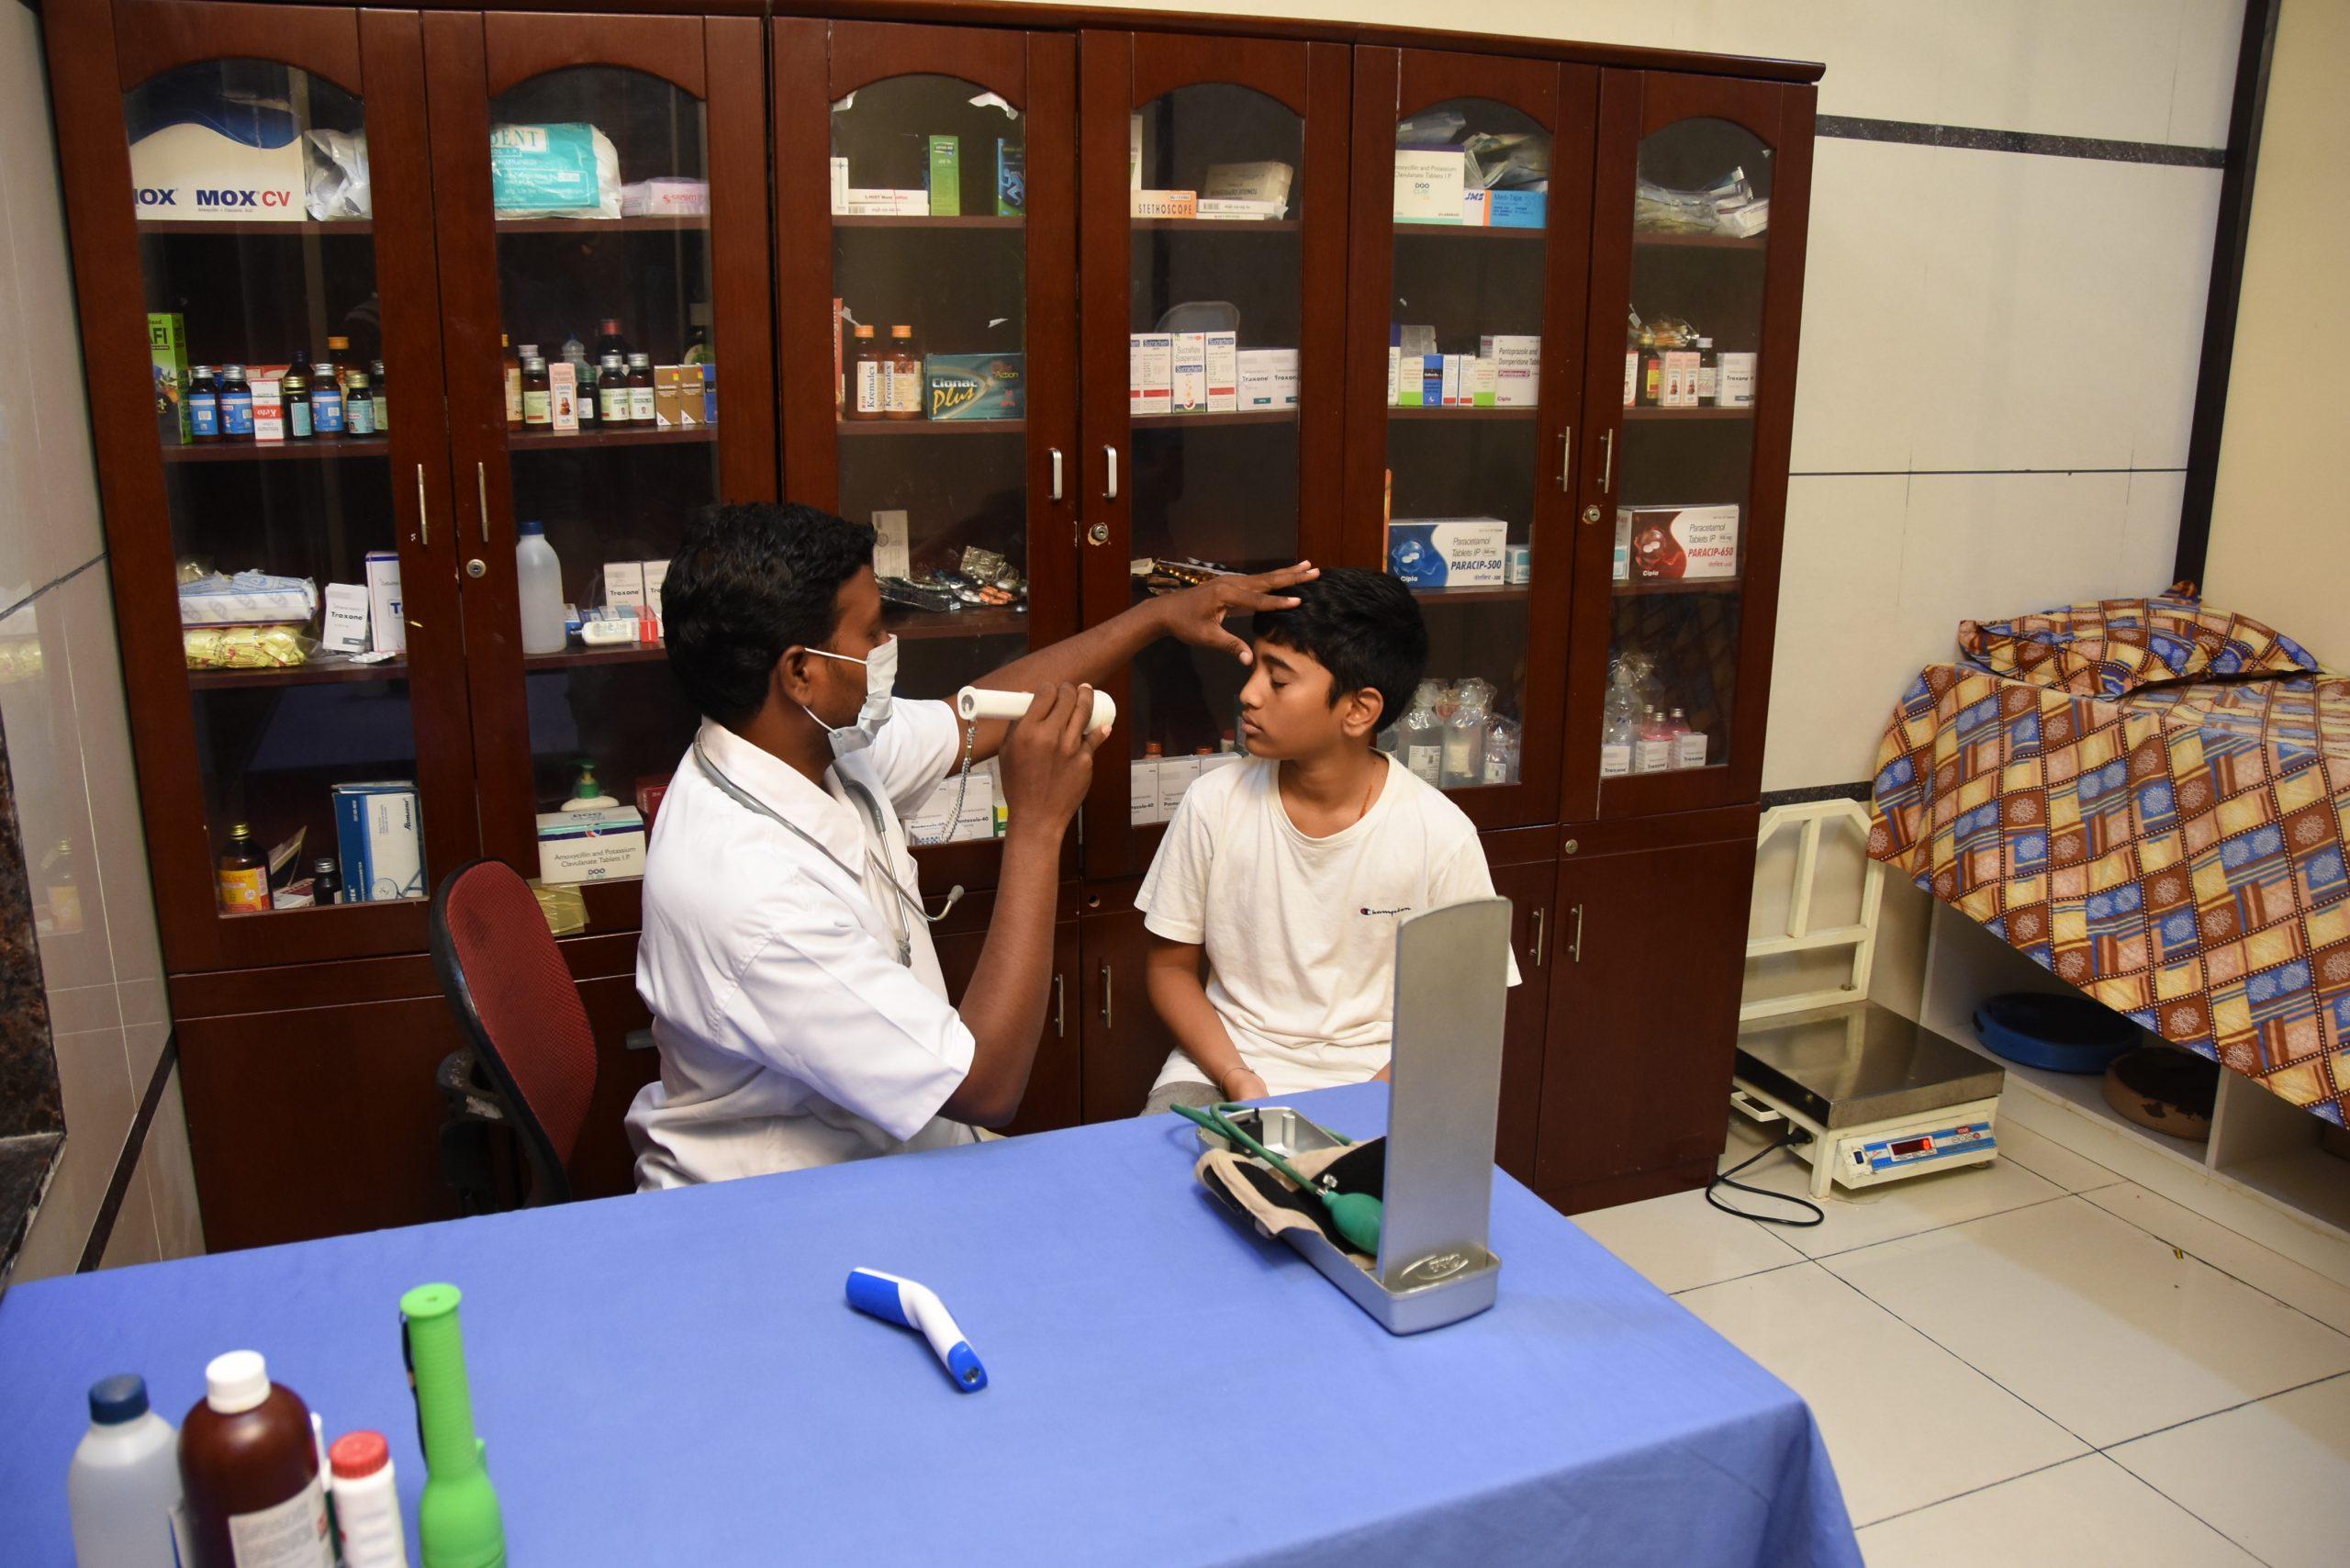 SHREE NEELAKANTH VIDYAPEETH First Aid Medical Room